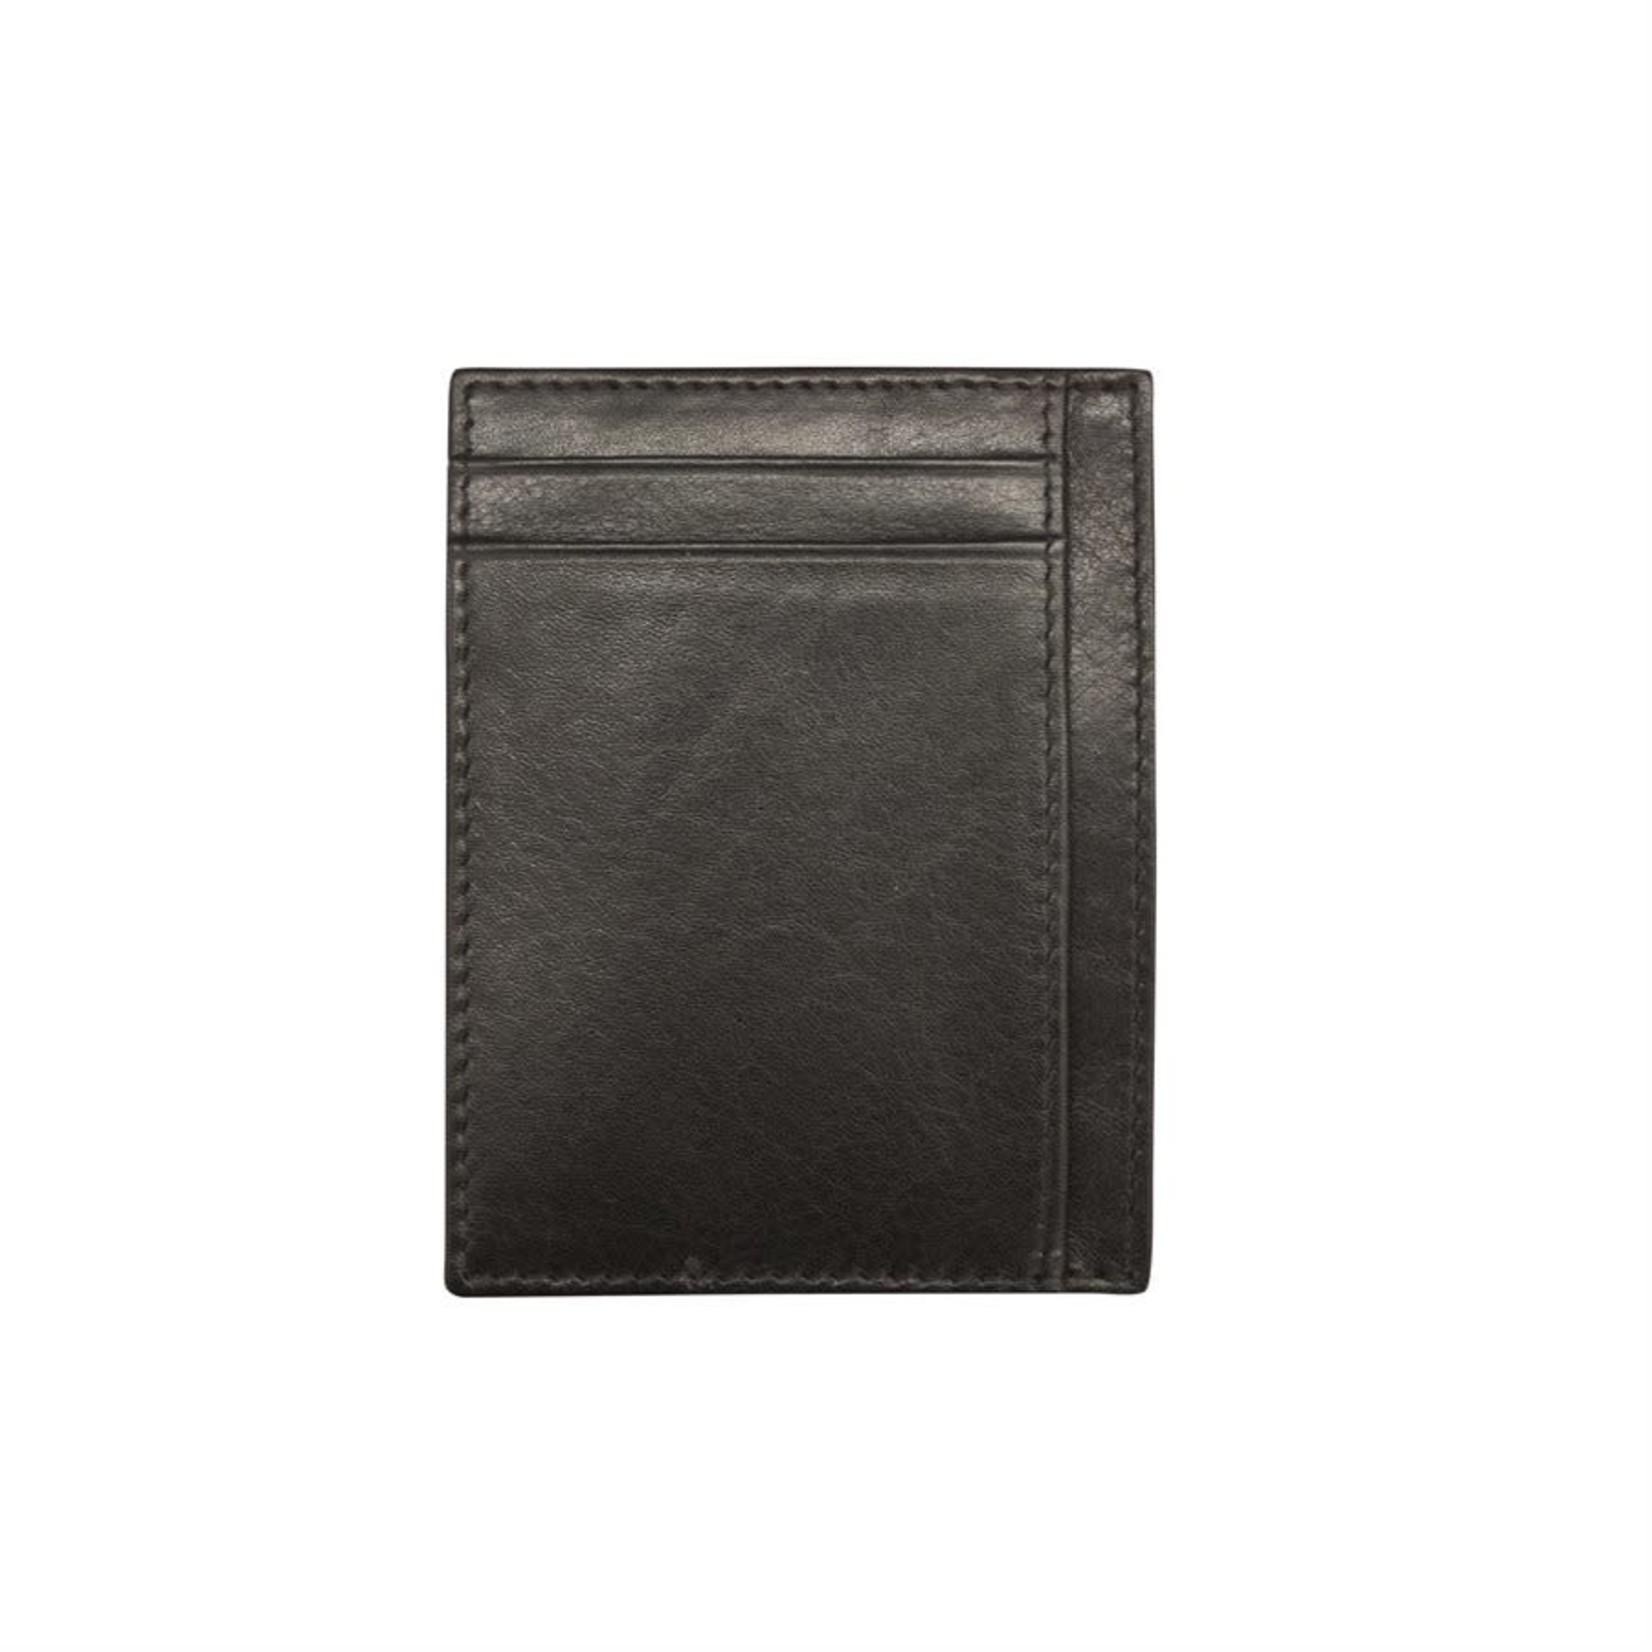 Leather Handbags and Accessories 7202 Black - RFID Mini Card Holder